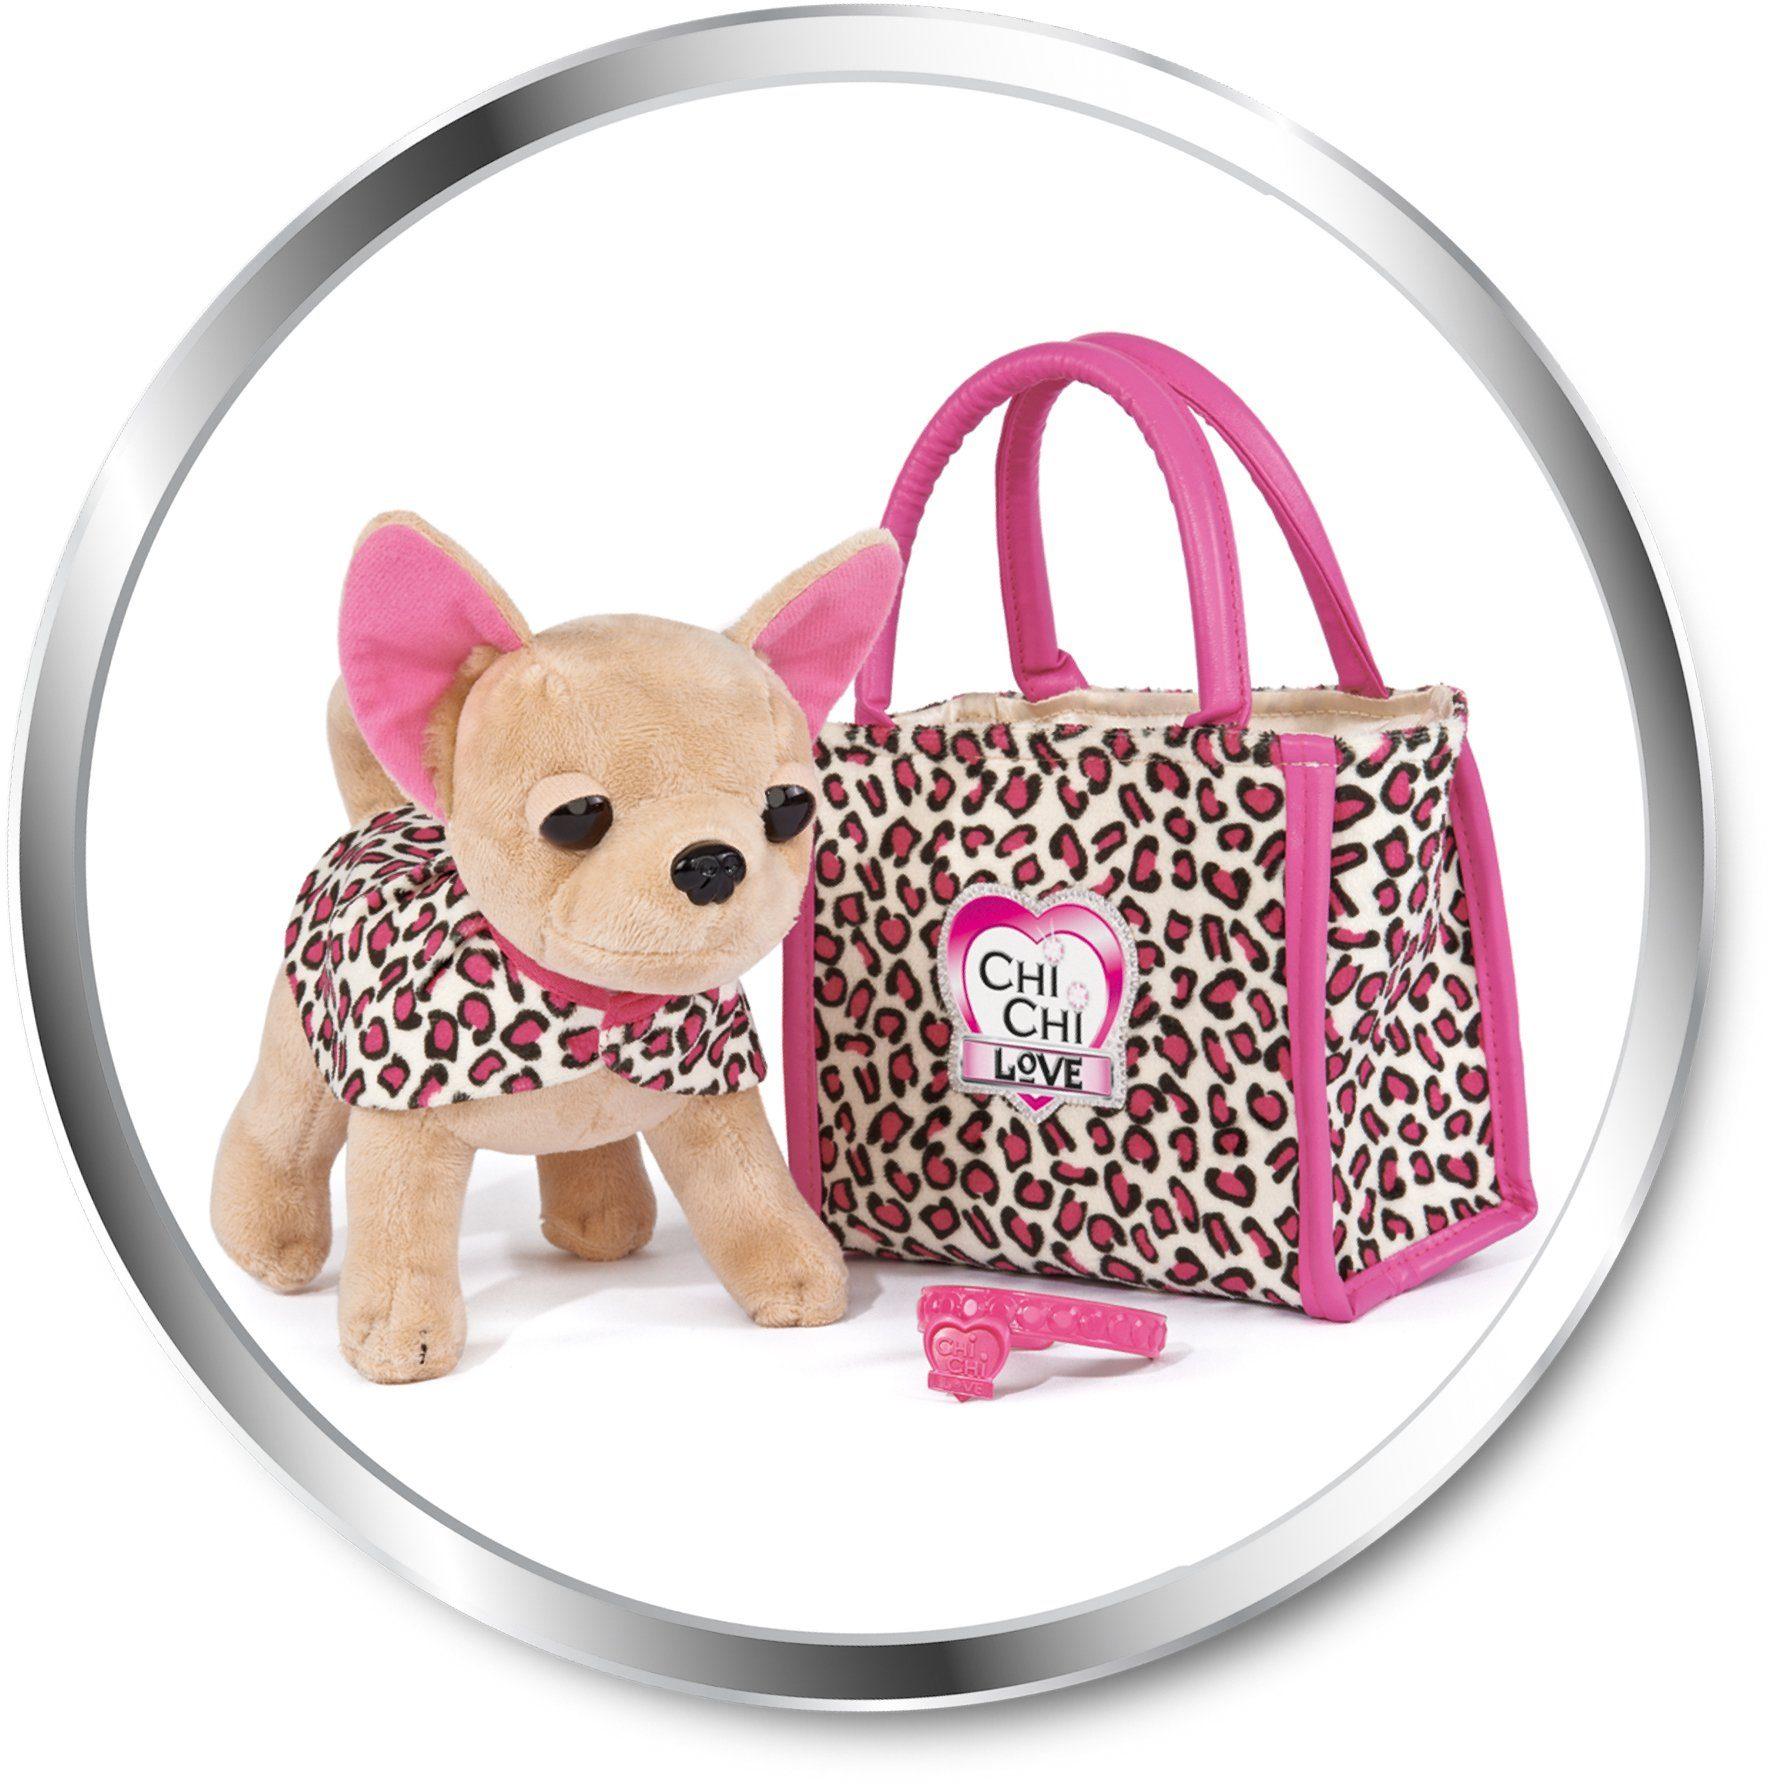 Simba Stofftier mit Tasche ca. 20 cm, »Chi Chi Love, Chihuahua Plüschhund Leo Fashion«